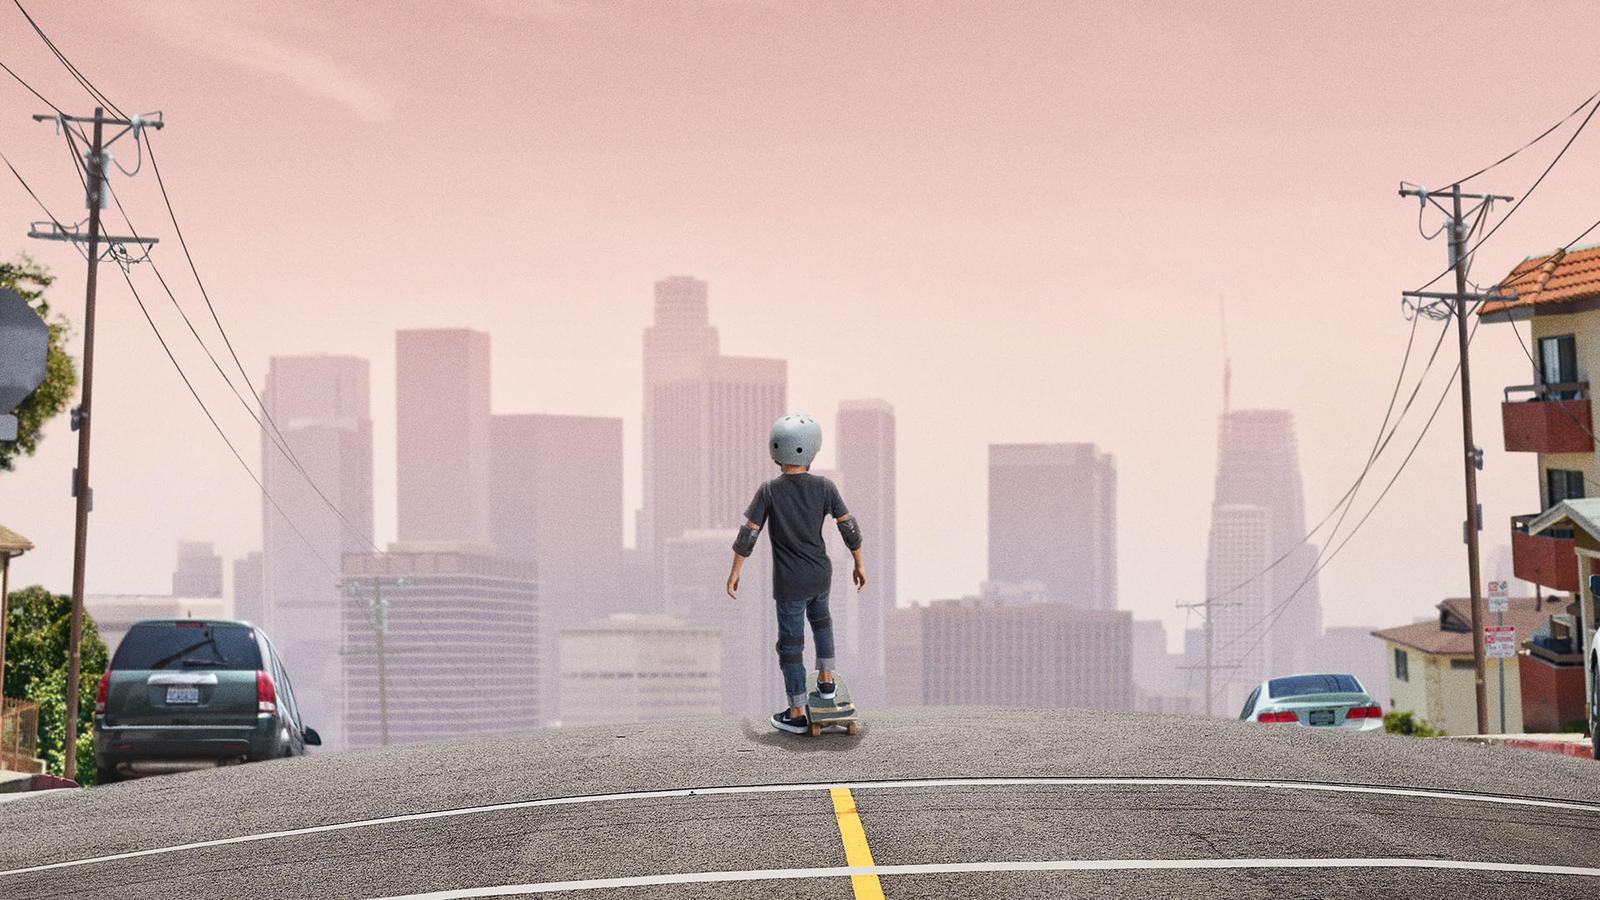 Nike unlimited you skateboard 2016 rio